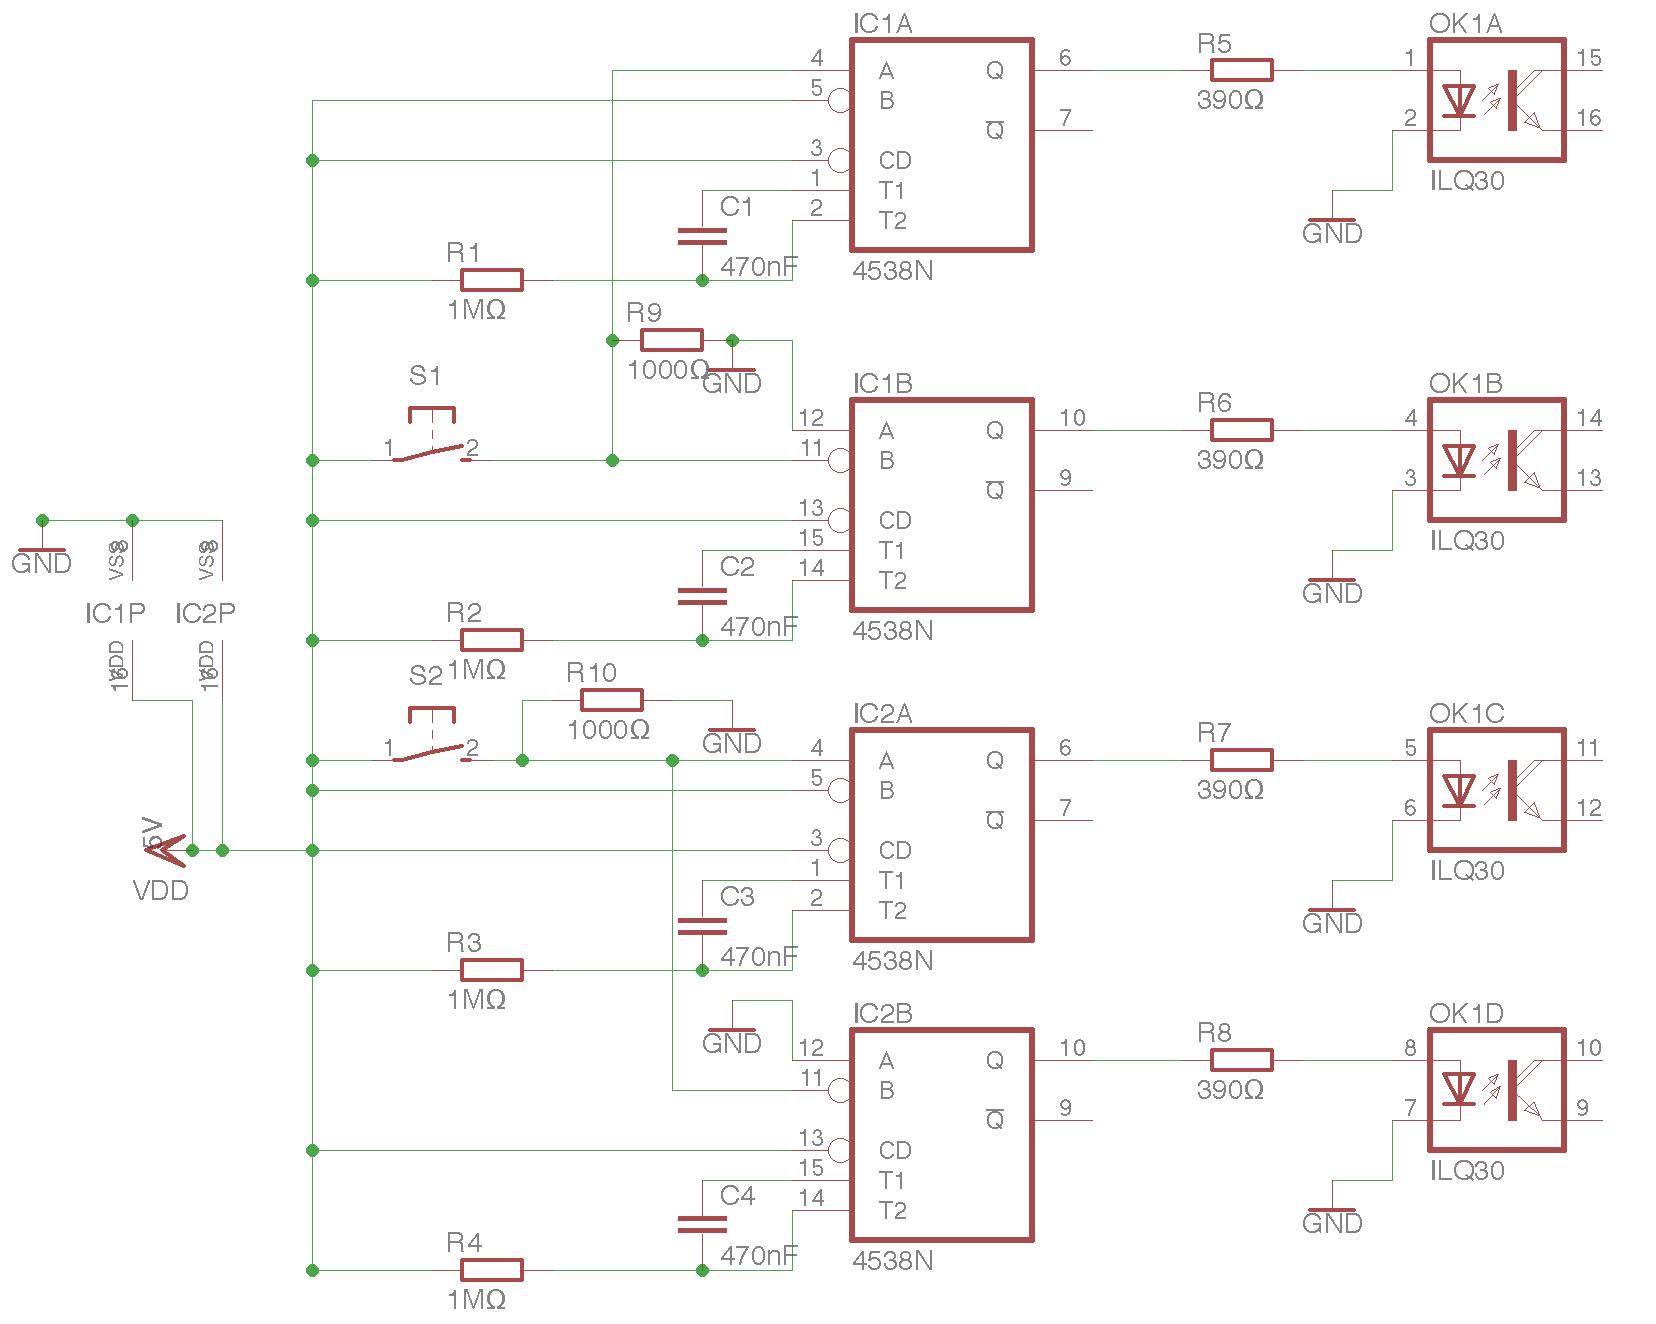 Fein Leuchtstofflampe Schaltplan Erklärung Ideen - Schaltplan Serie ...